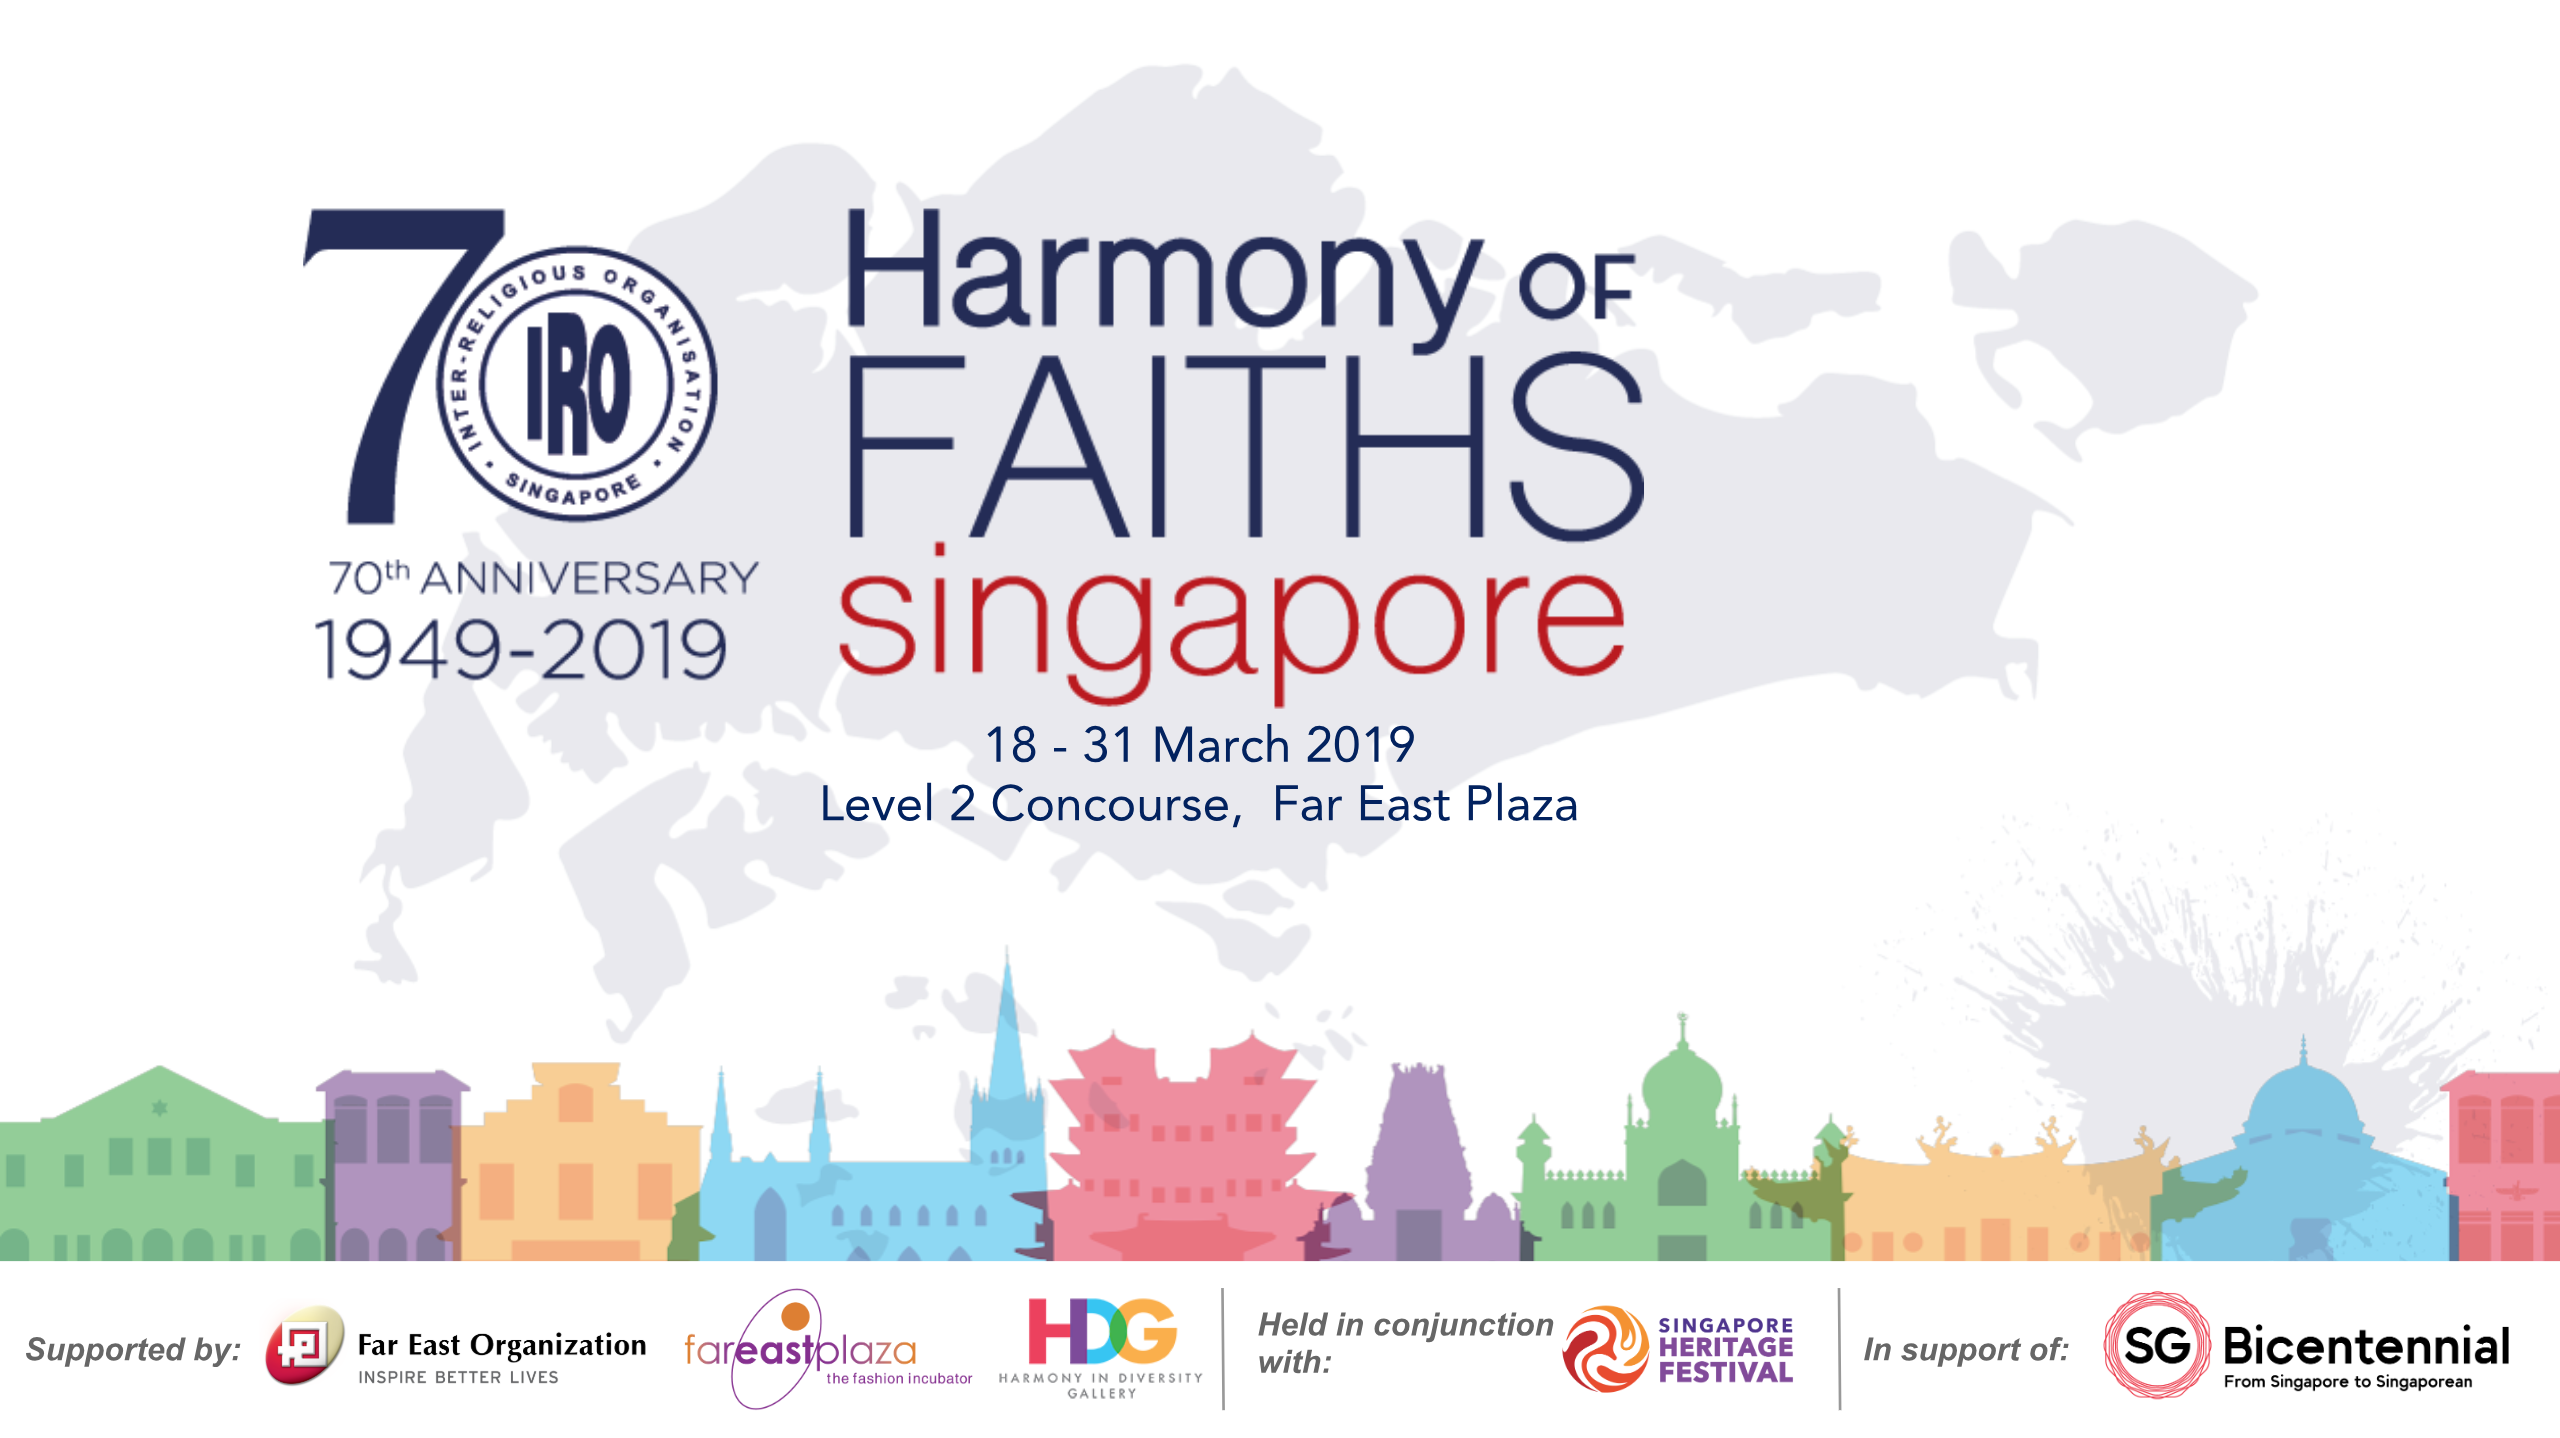 Harmony of Faiths Exhibition